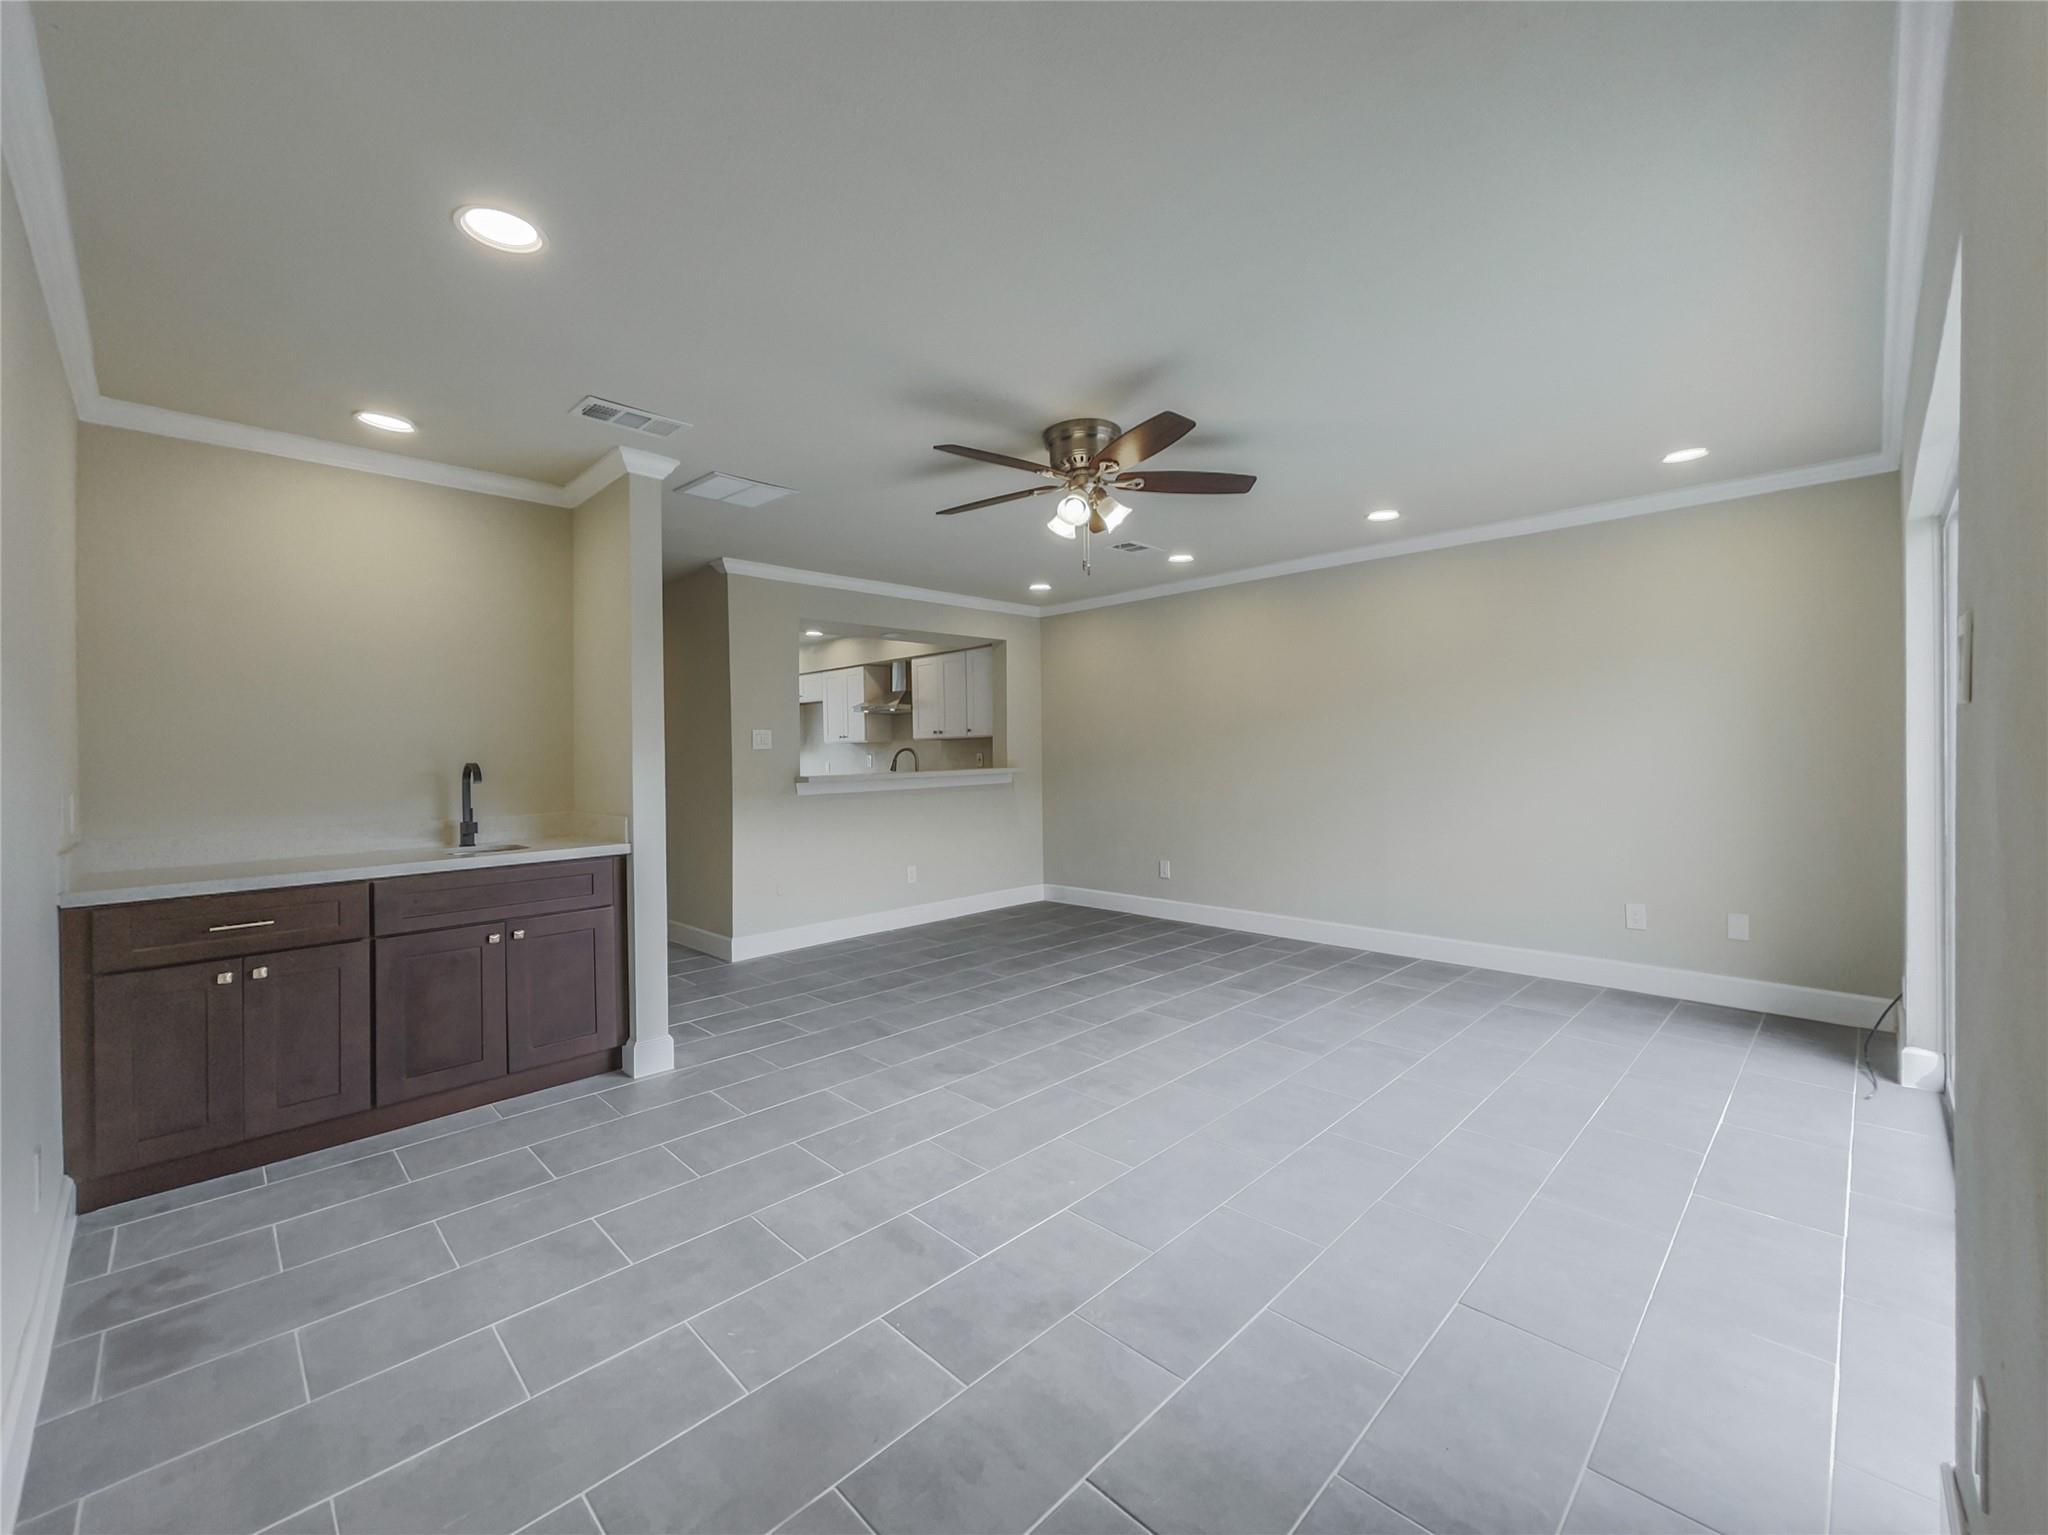 9200 W Bellfort Avenue #17 Property Photo - Houston, TX real estate listing